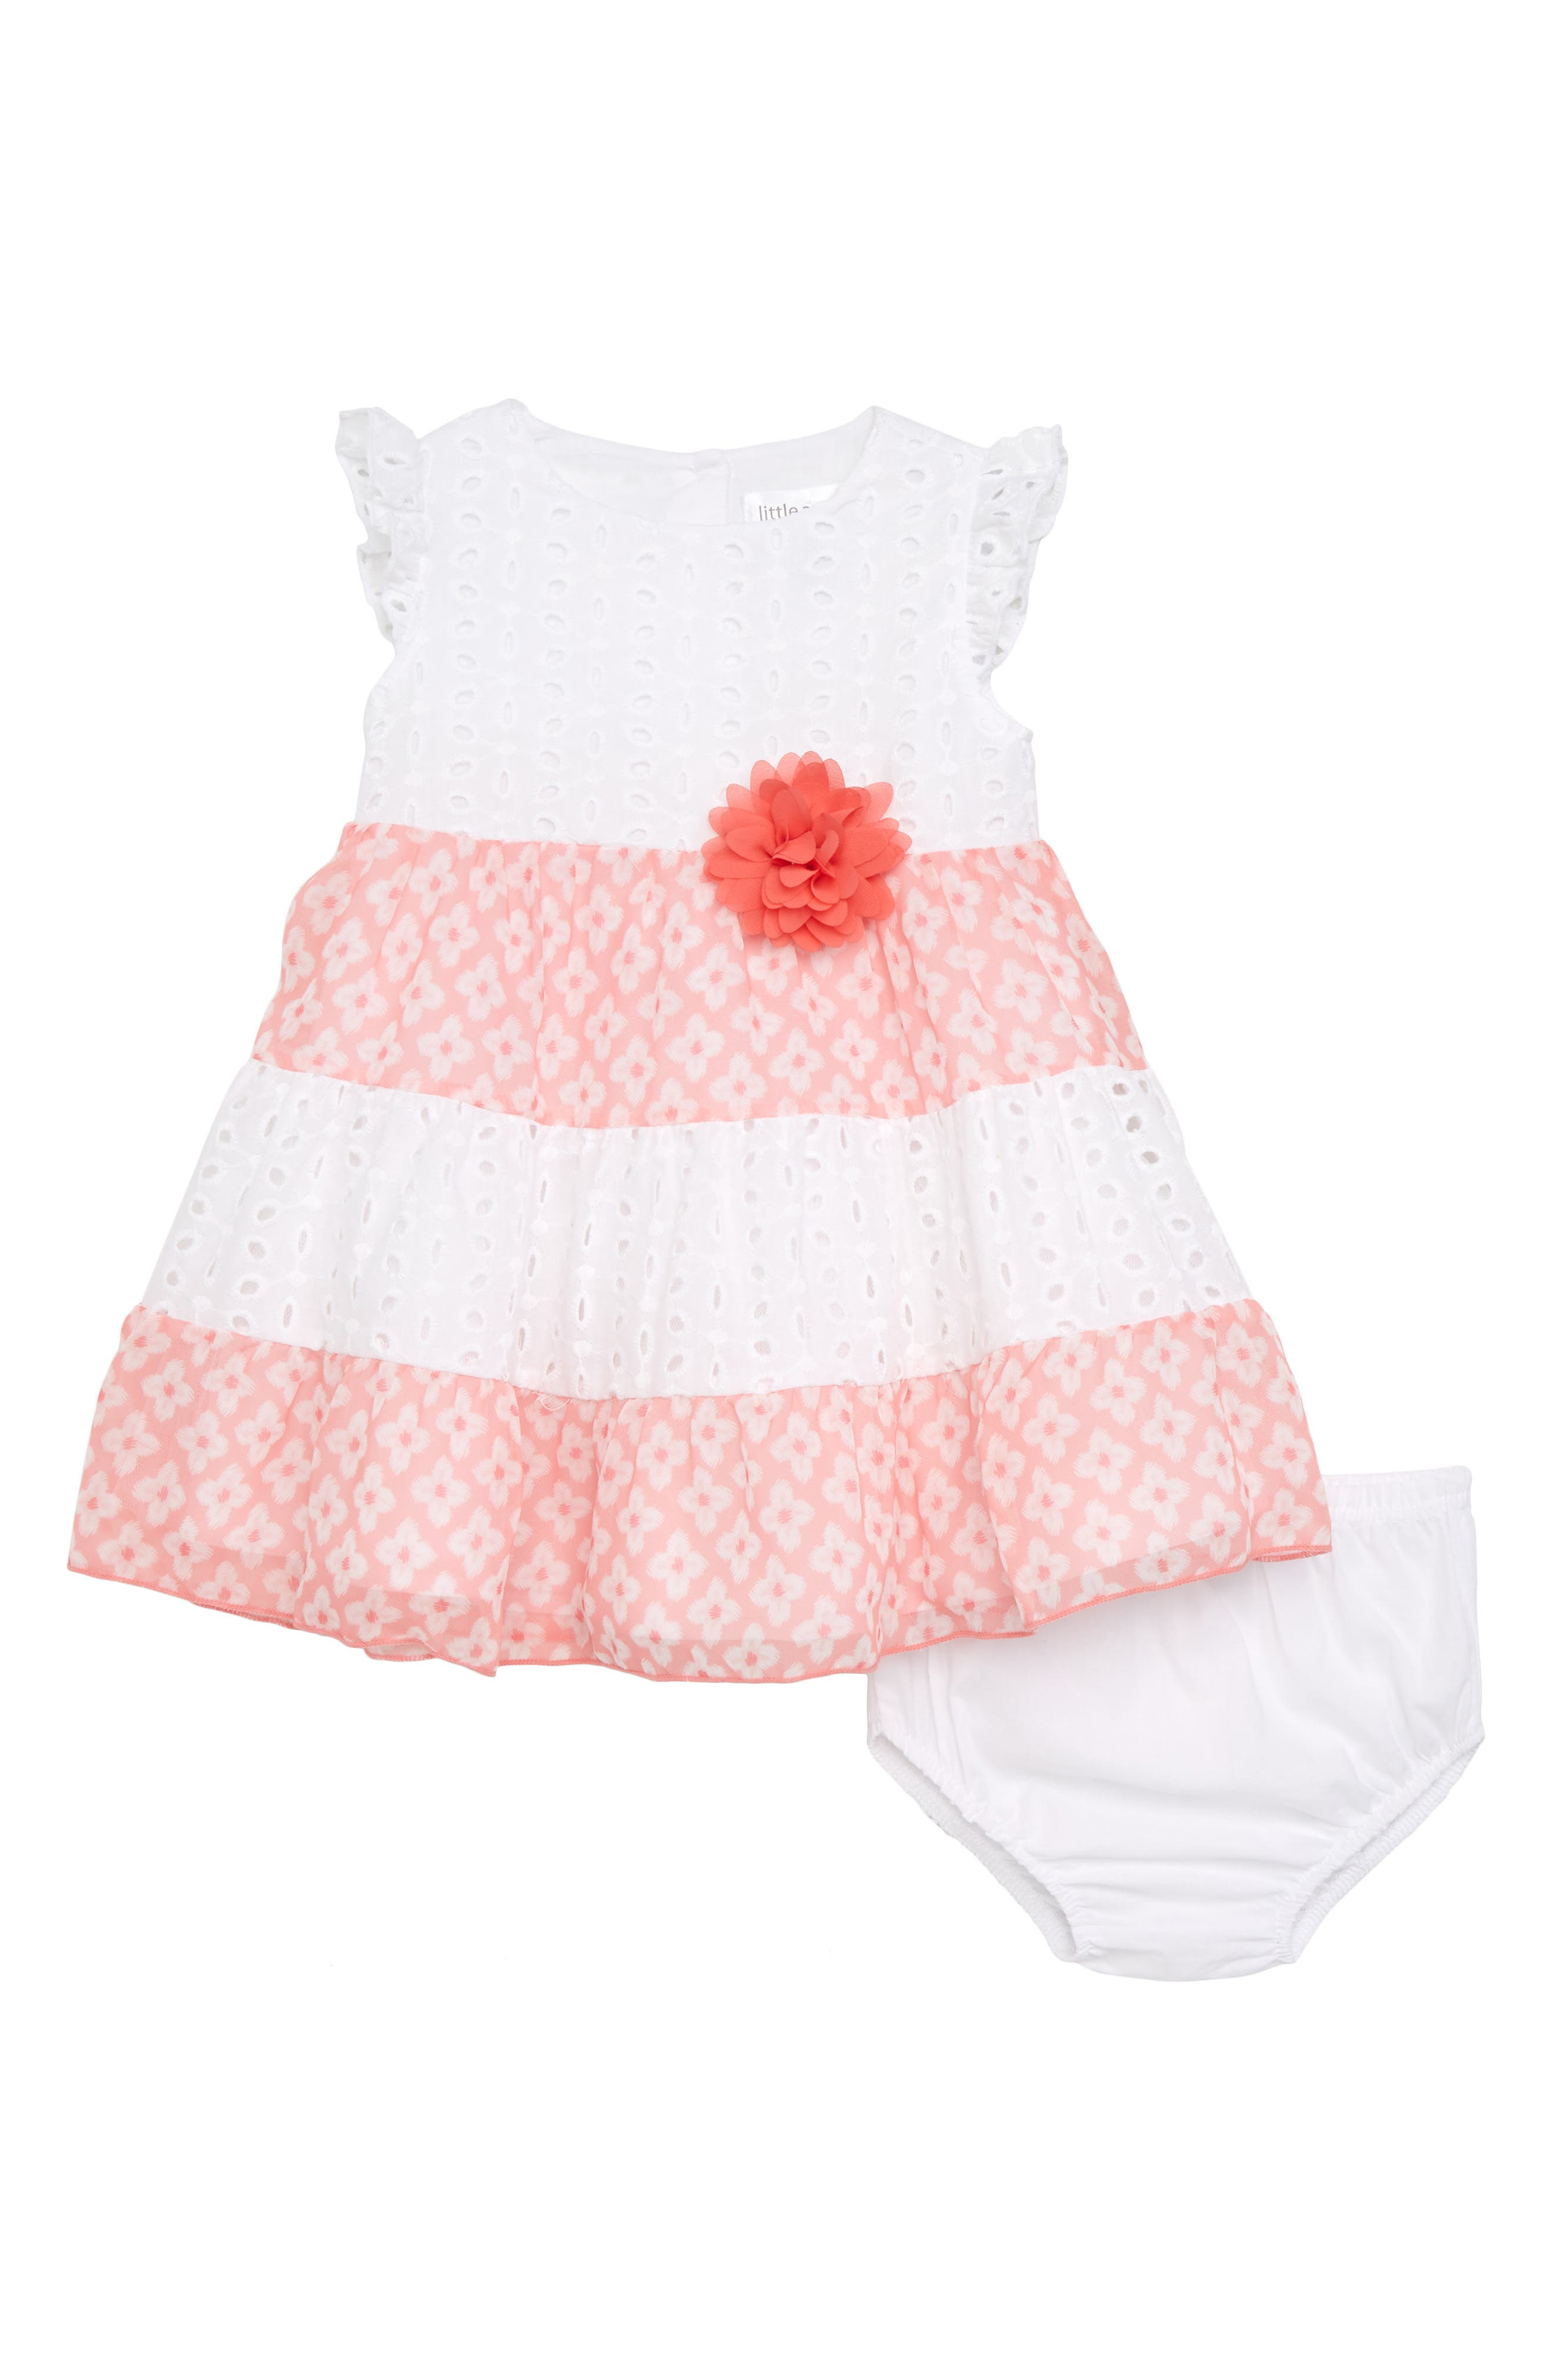 Eyelet Lace Dress with Chiffon Trim,                             Main thumbnail 1, color,                             Coral